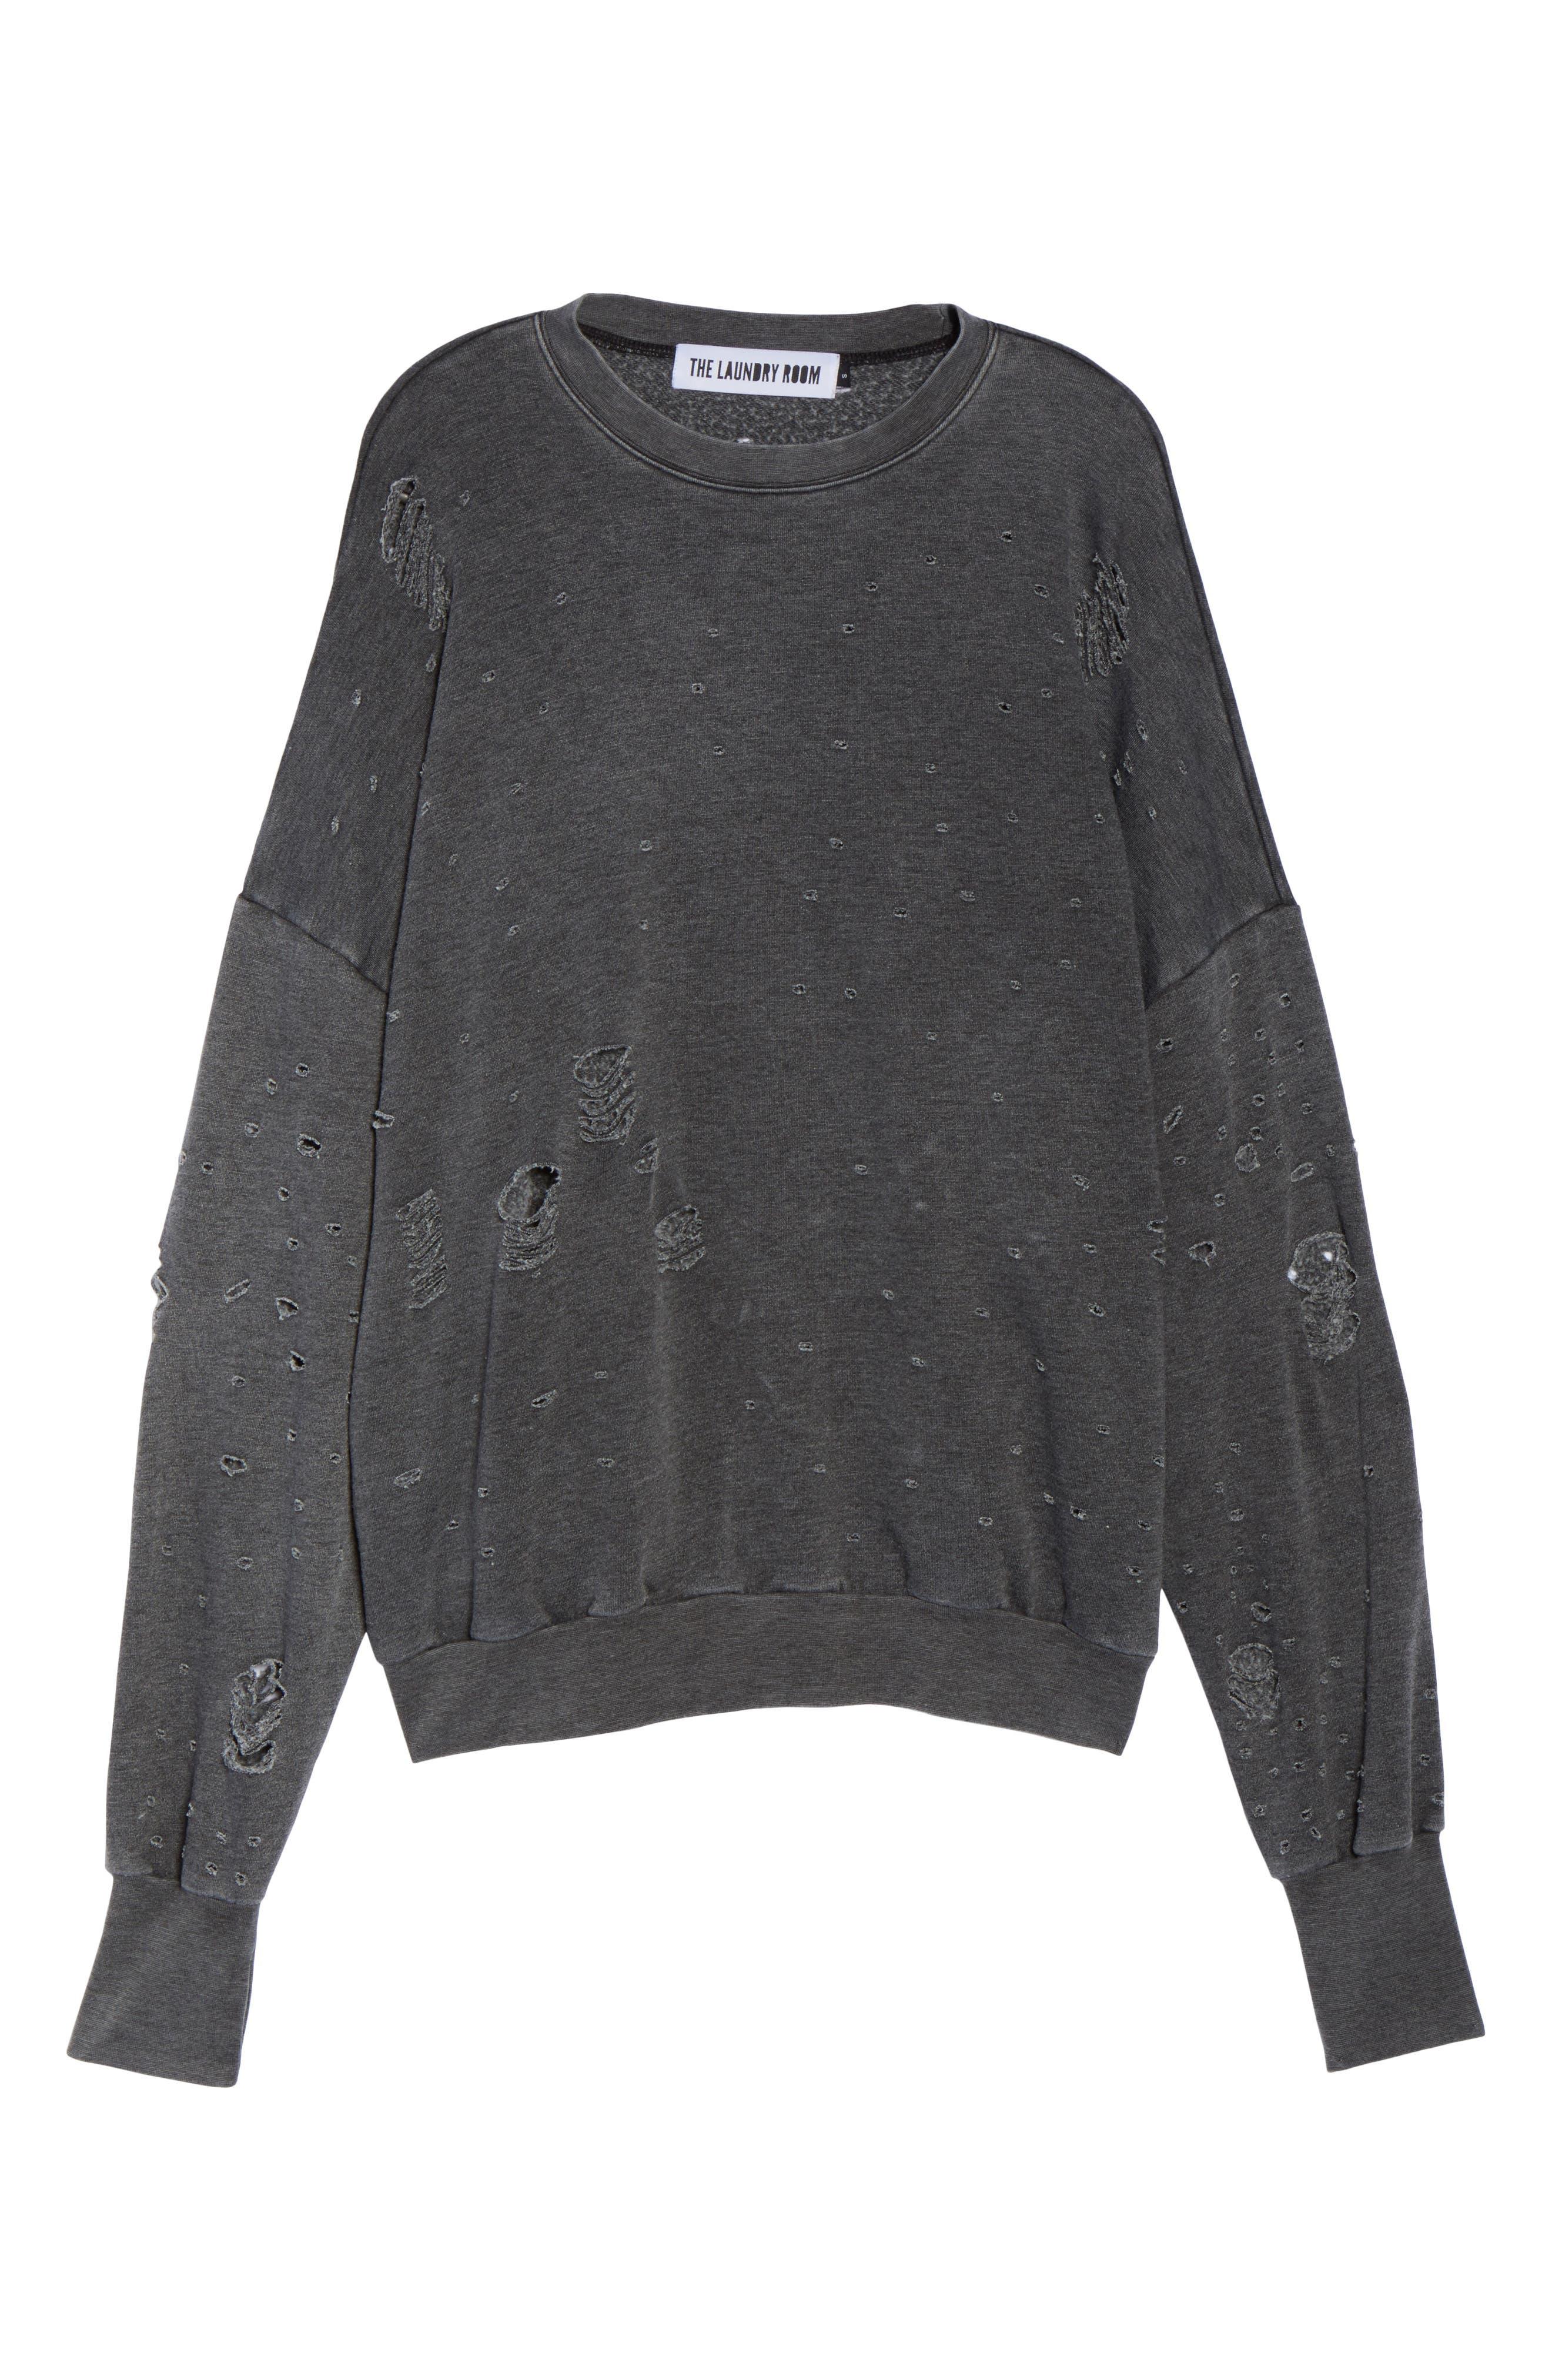 Thrasher Sweatshirt,                             Alternate thumbnail 11, color,